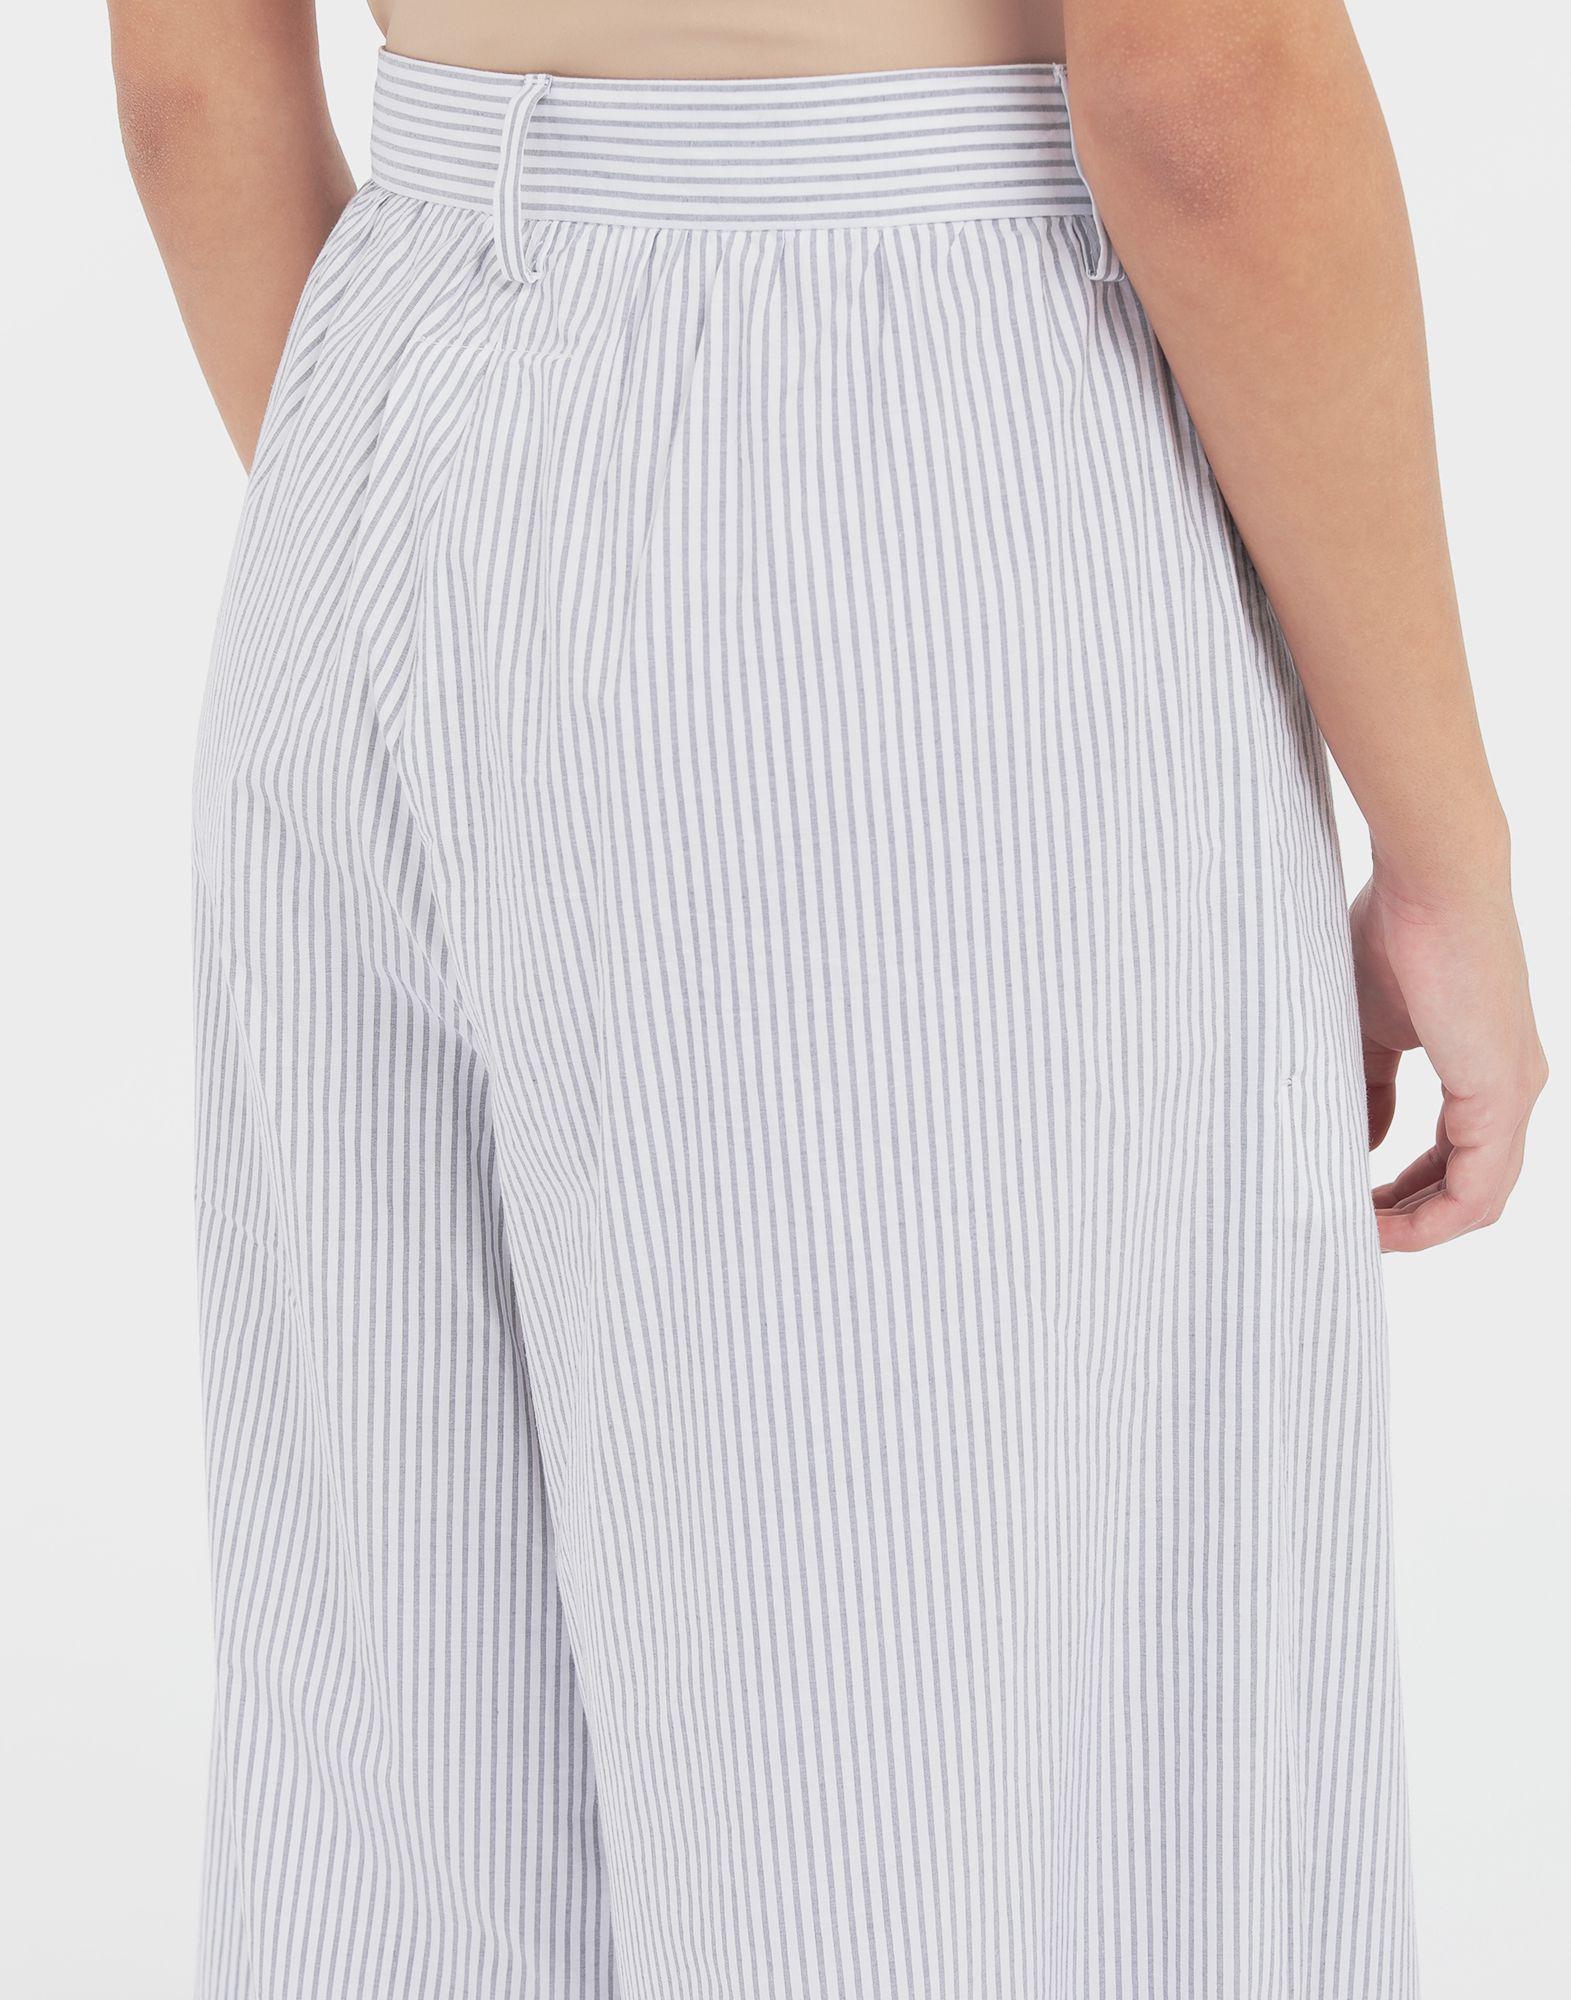 MM6 MAISON MARGIELA Flared striped cotton pants Trousers Woman b